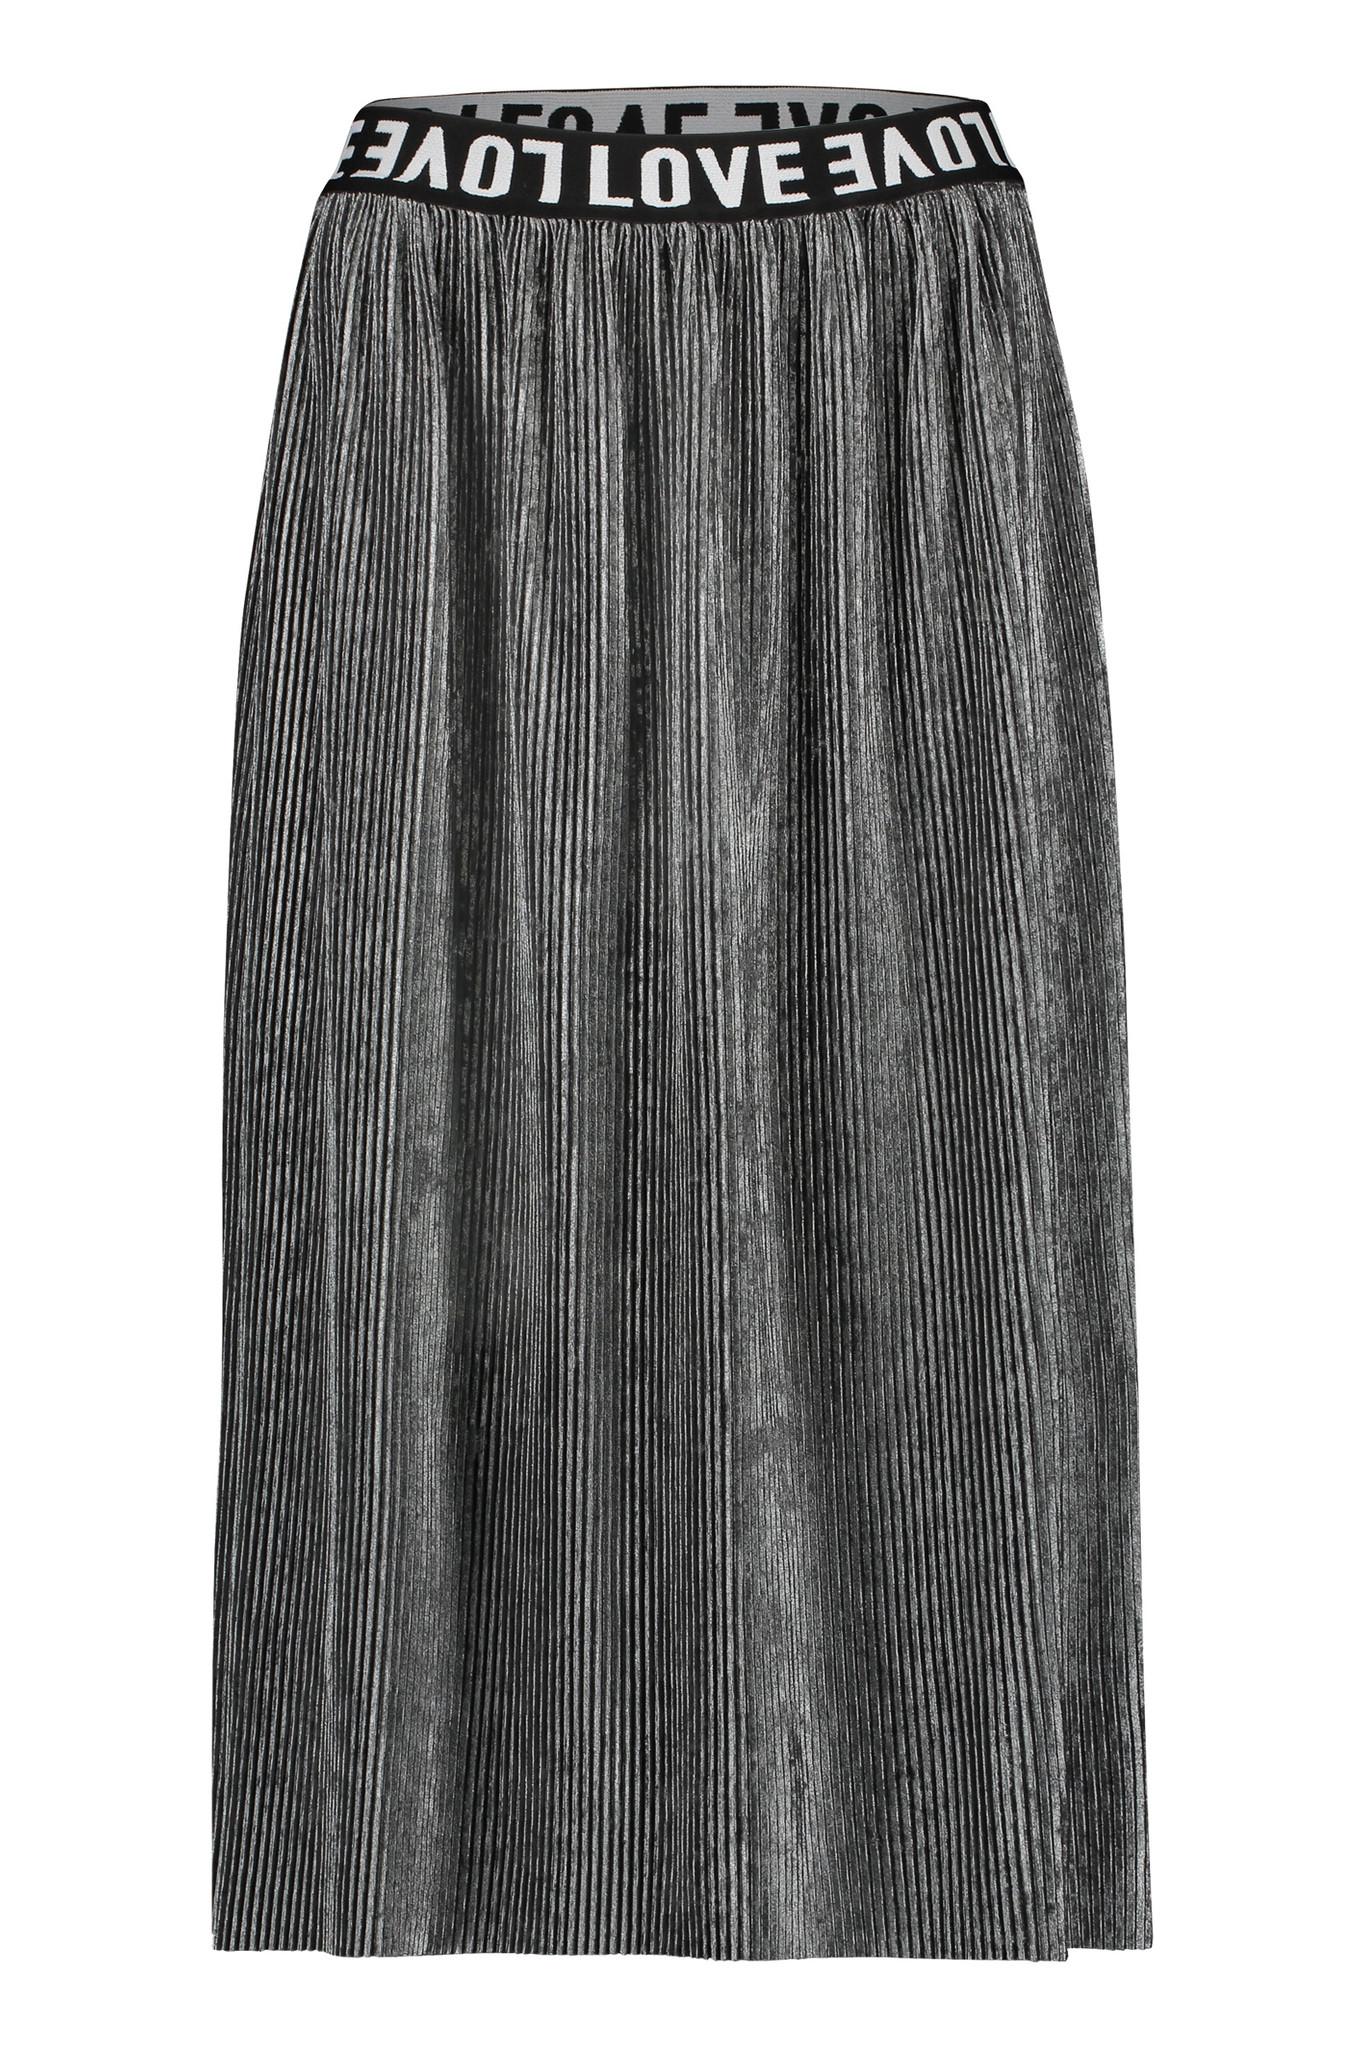 Penn & Ink W19T308LTD 83  Penn en Ink N.Y. skirt plisse grey silver